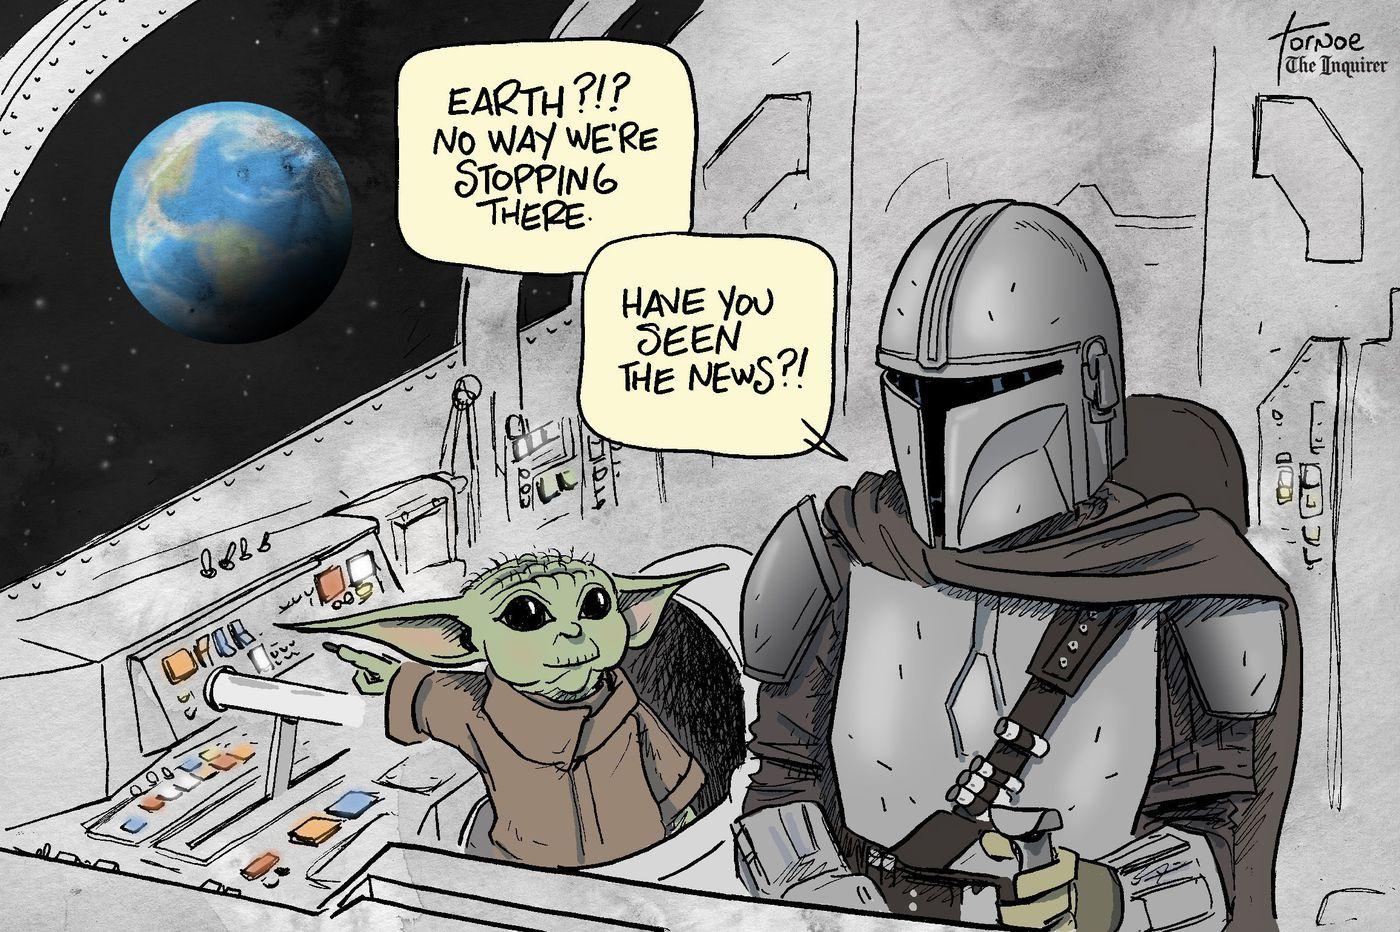 Cartoon: Don't let Baby Yoda set foot on Earth